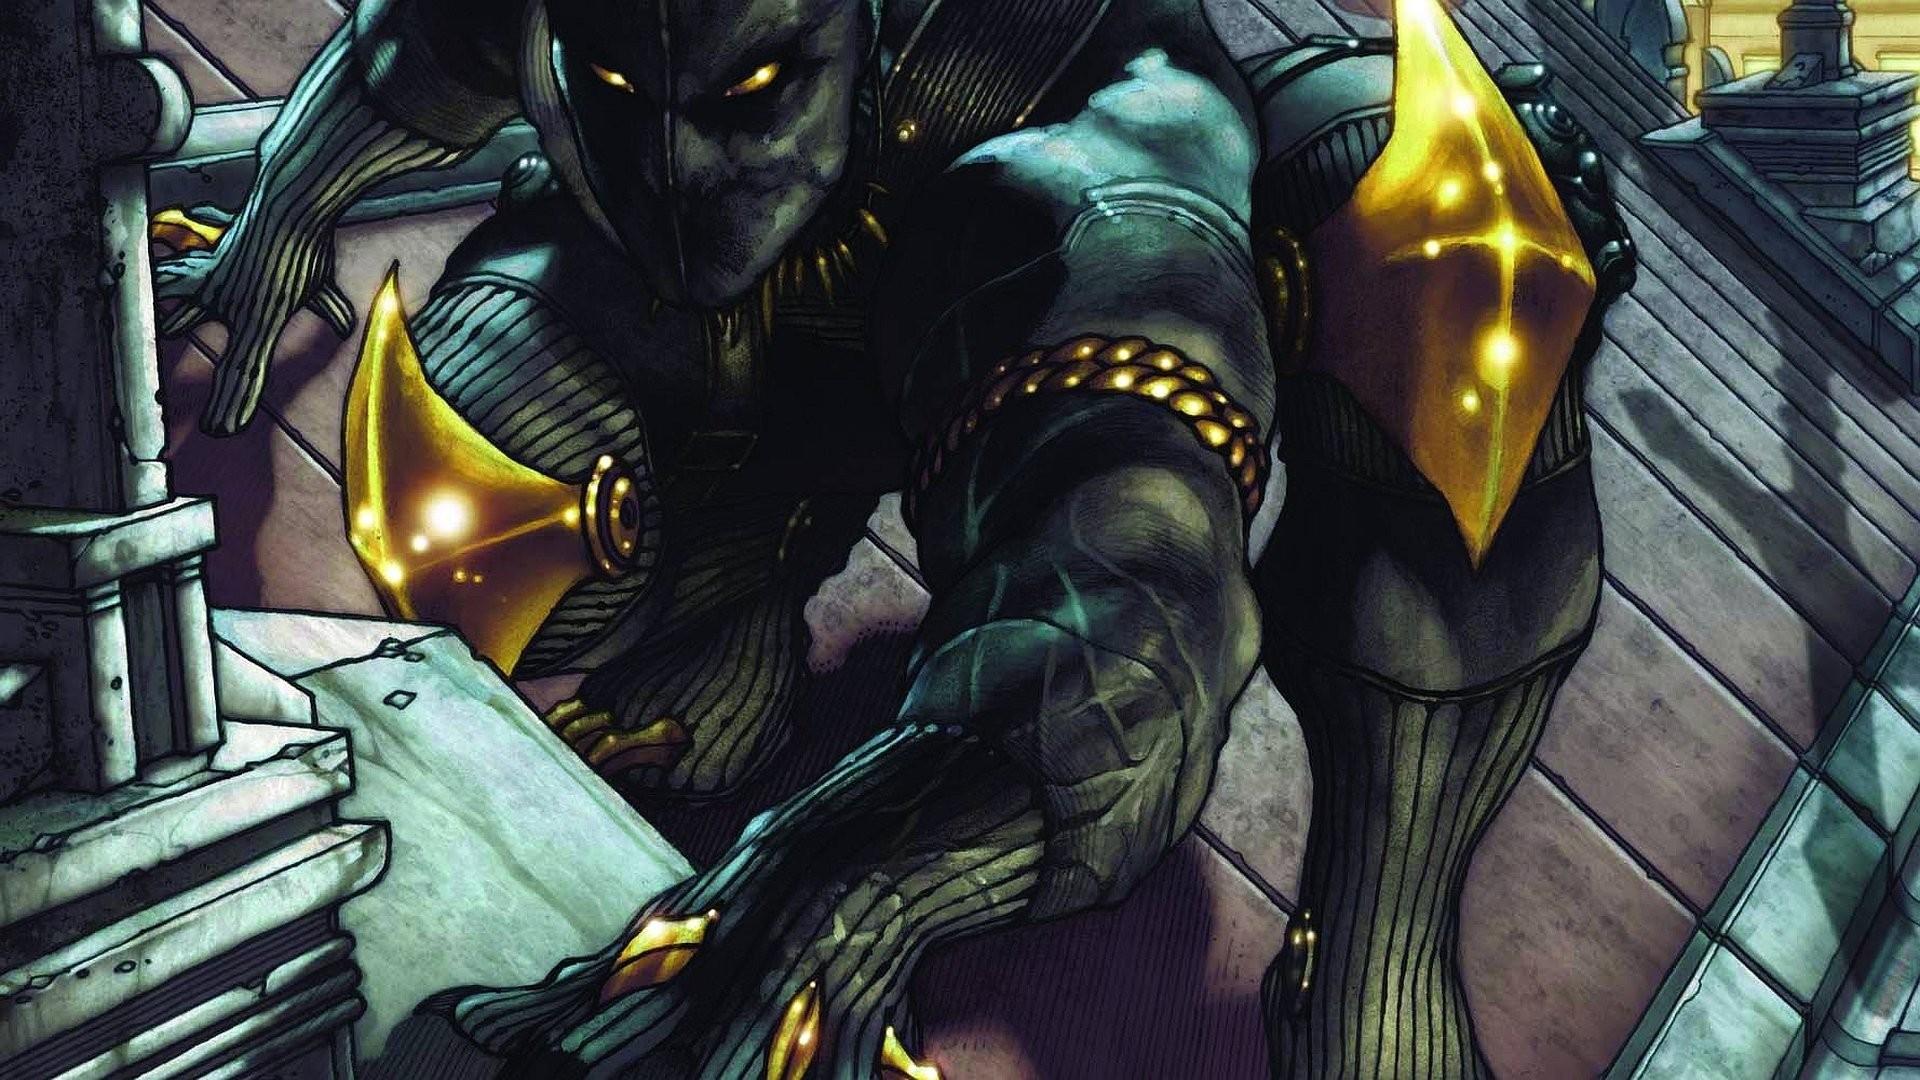 Comics – Black Panther Black Panther (Marvel) Wallpaper